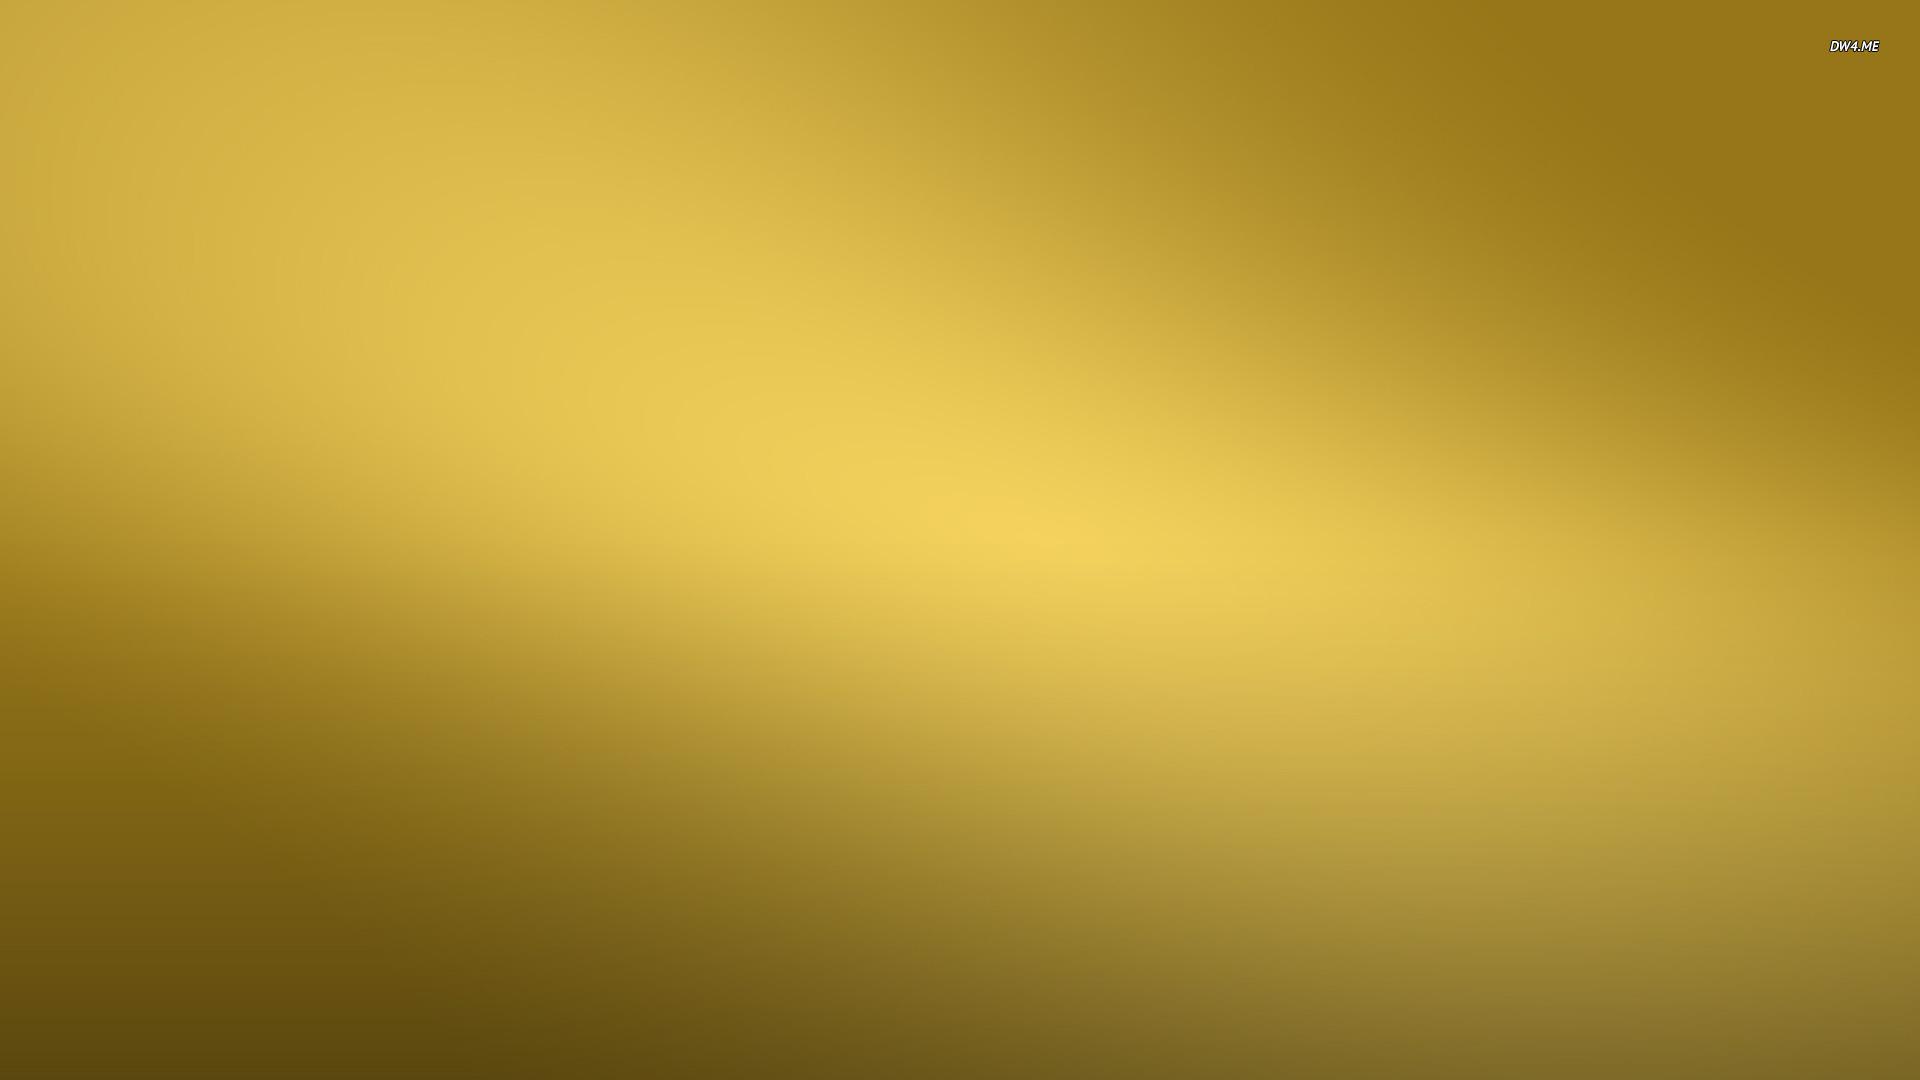 Gold wallpaper   Minimalistic wallpapers   389 1920x1080